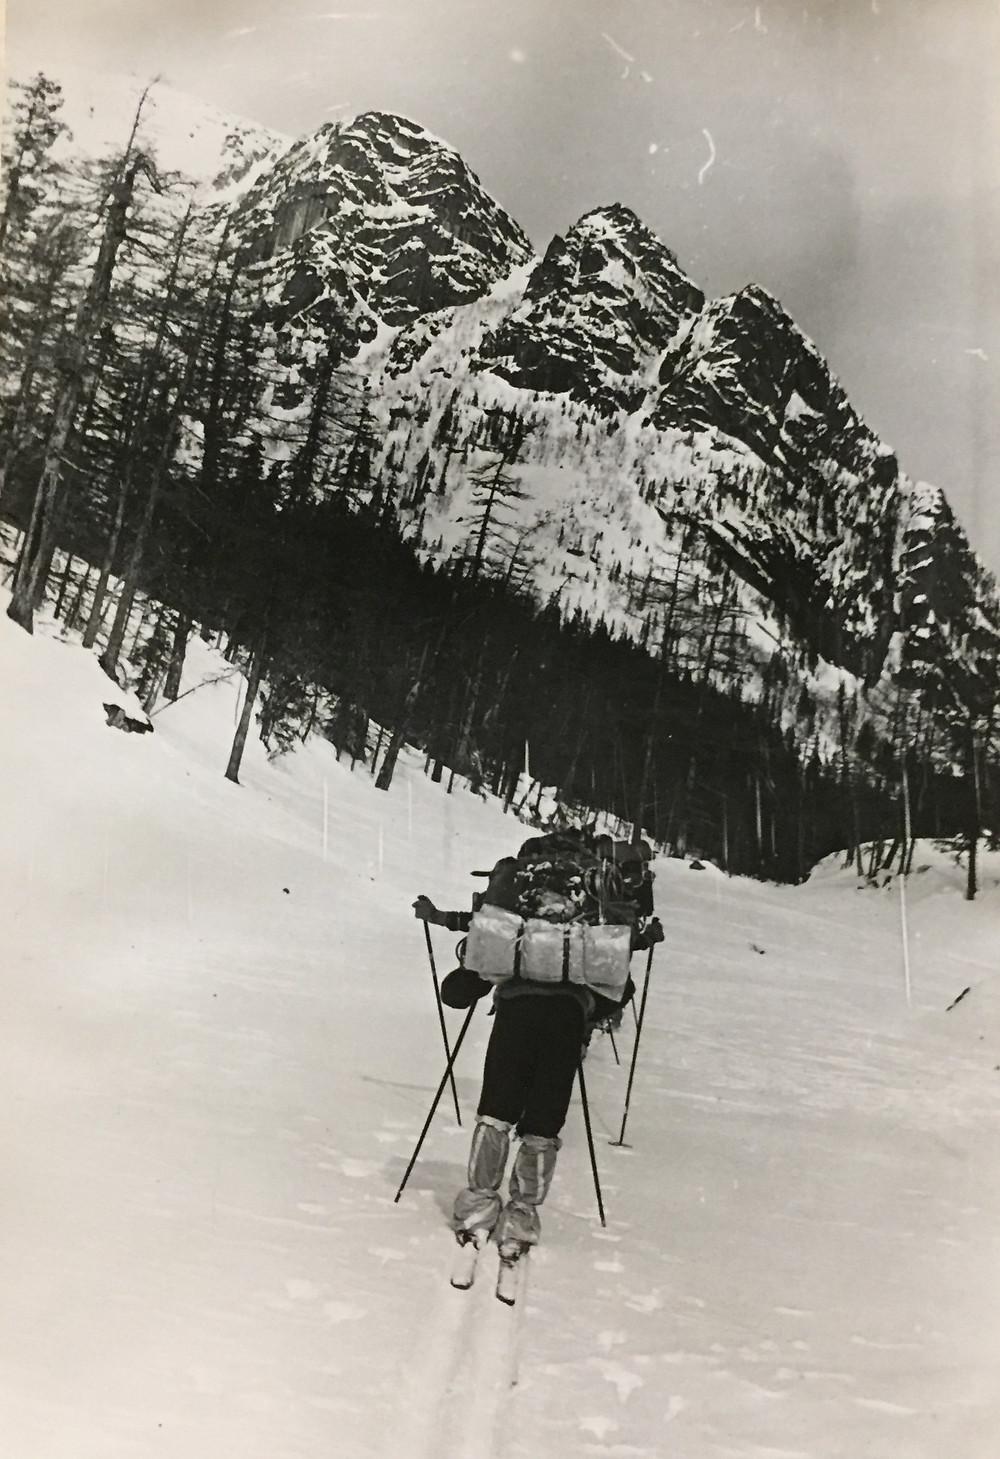 Скалы| skitour.club| Блог Сергея Чеботова